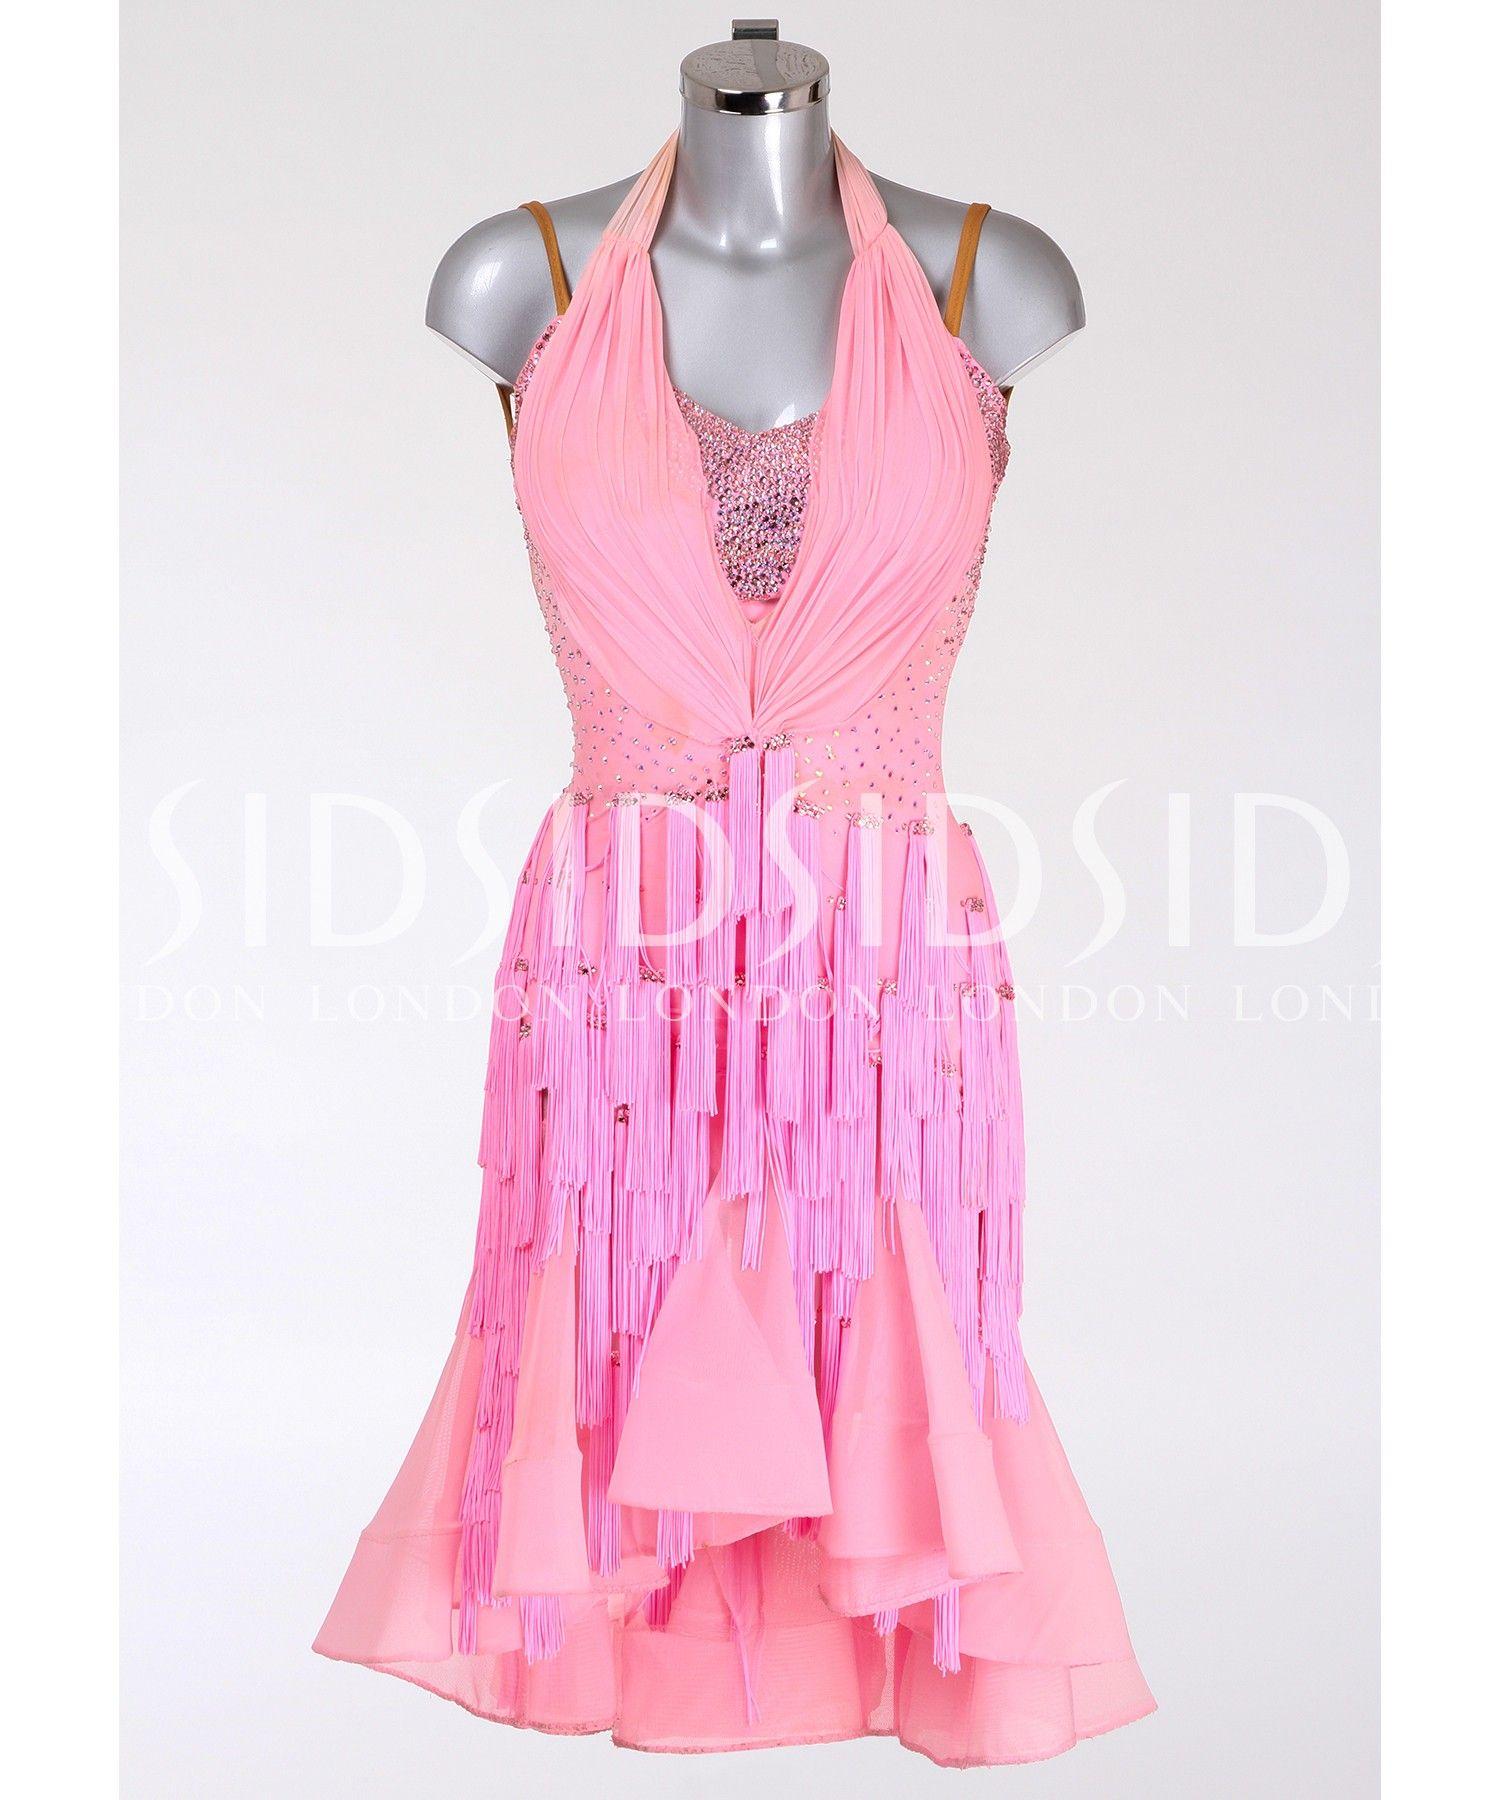 Janette manrara wedding dress  Click to magnifyshrink  Ballroom Dresses  Pinterest  Dance